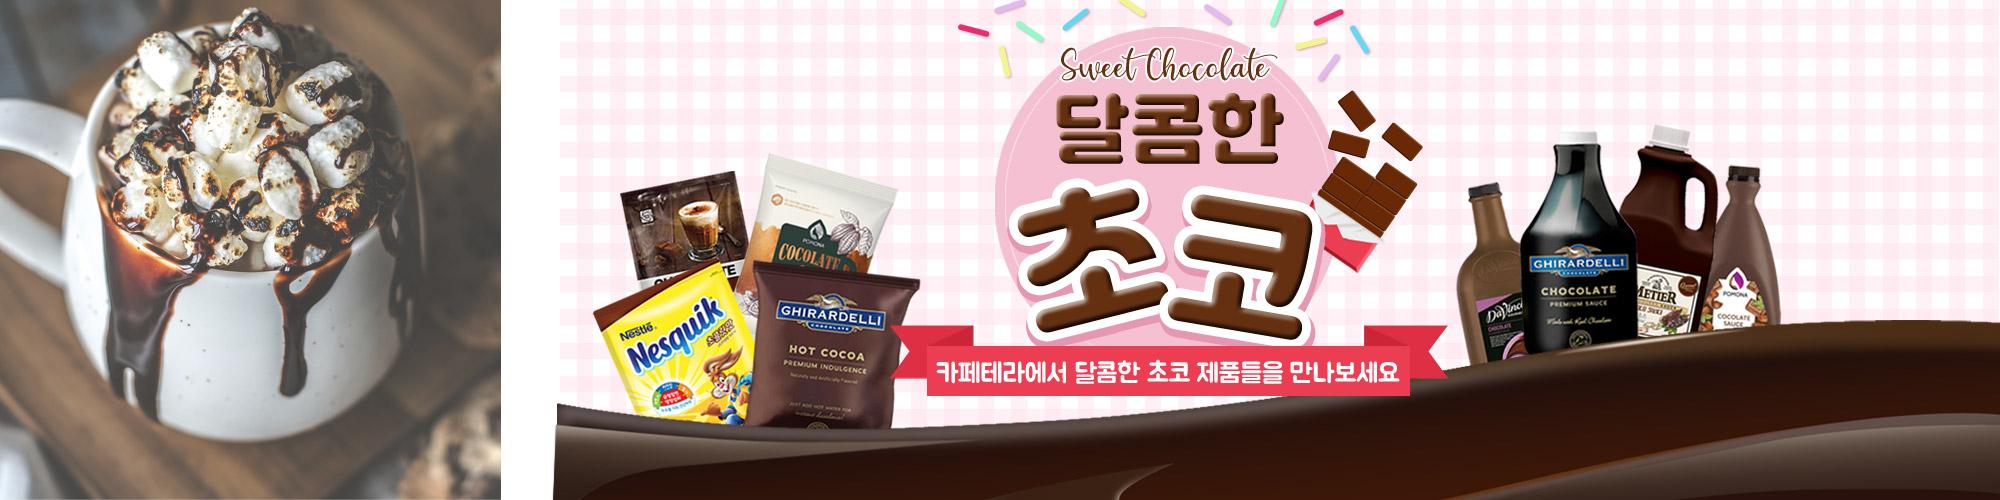 SweetChocolate_2000